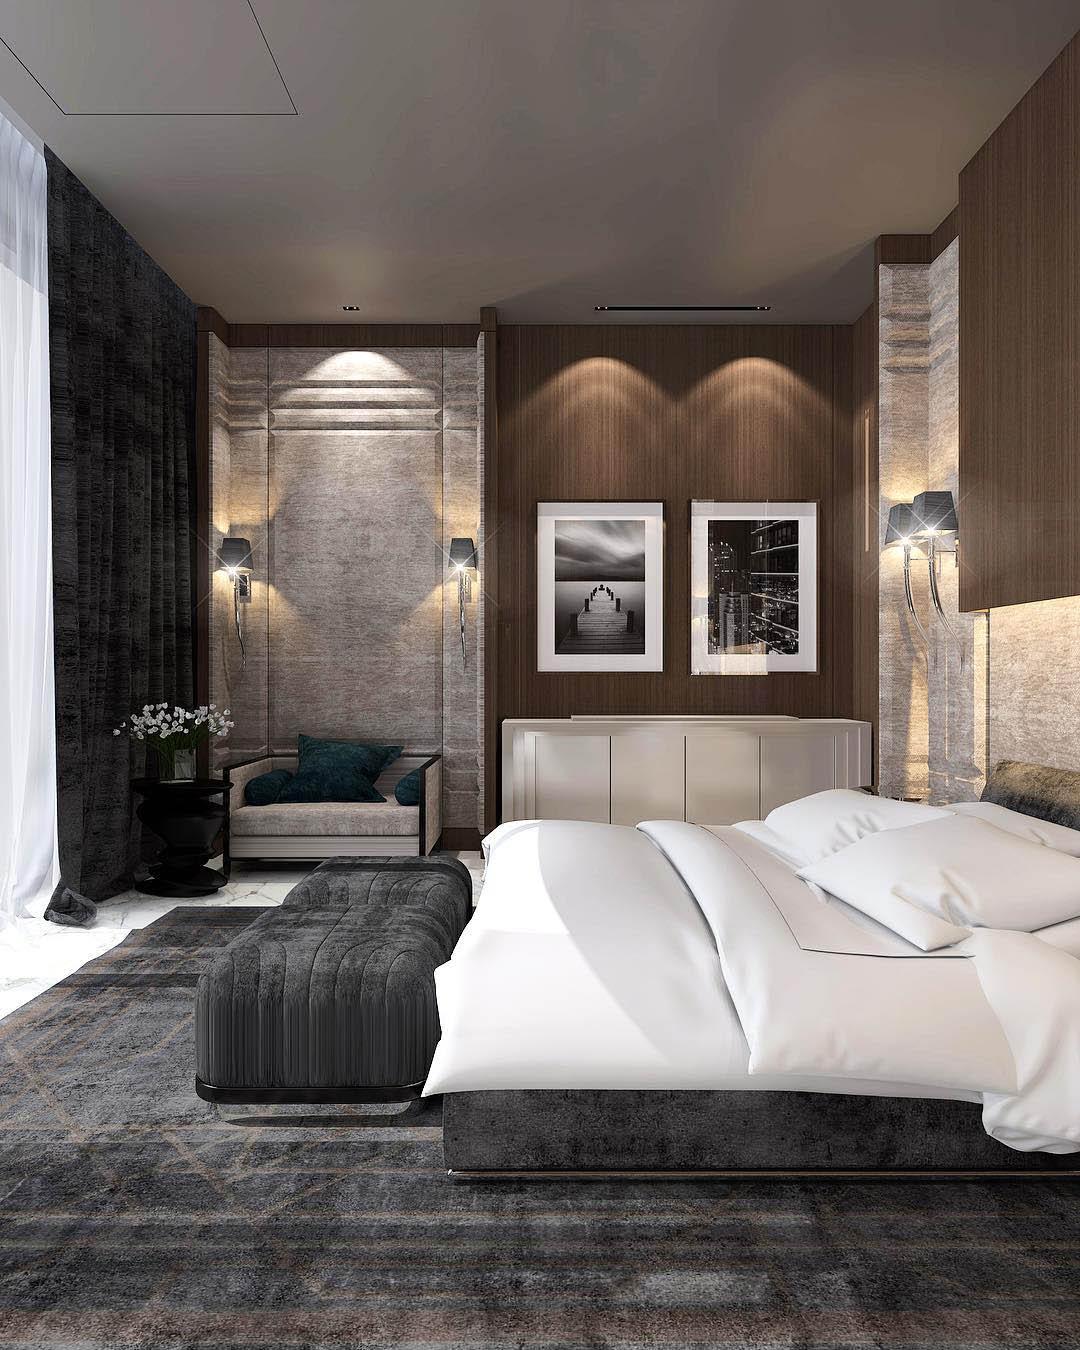 Constantin Frolov Interior Design | Luxurious Bedroom Ideas